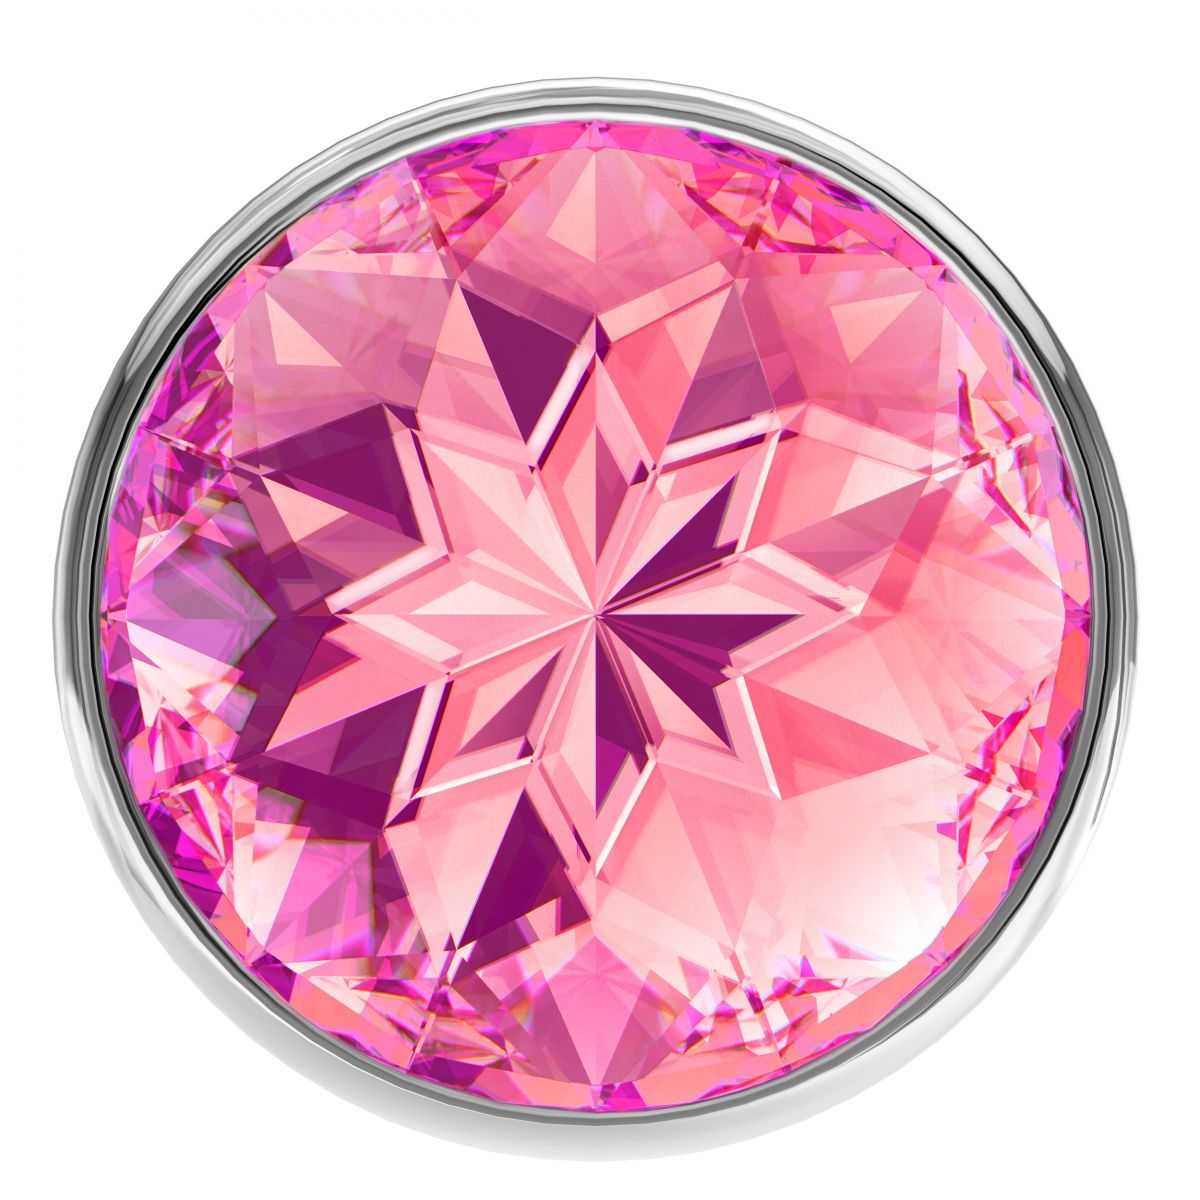 Малая серебристая анальная пробка Diamond Pink Sparkle Small с розовым кристаллом - 7 см.